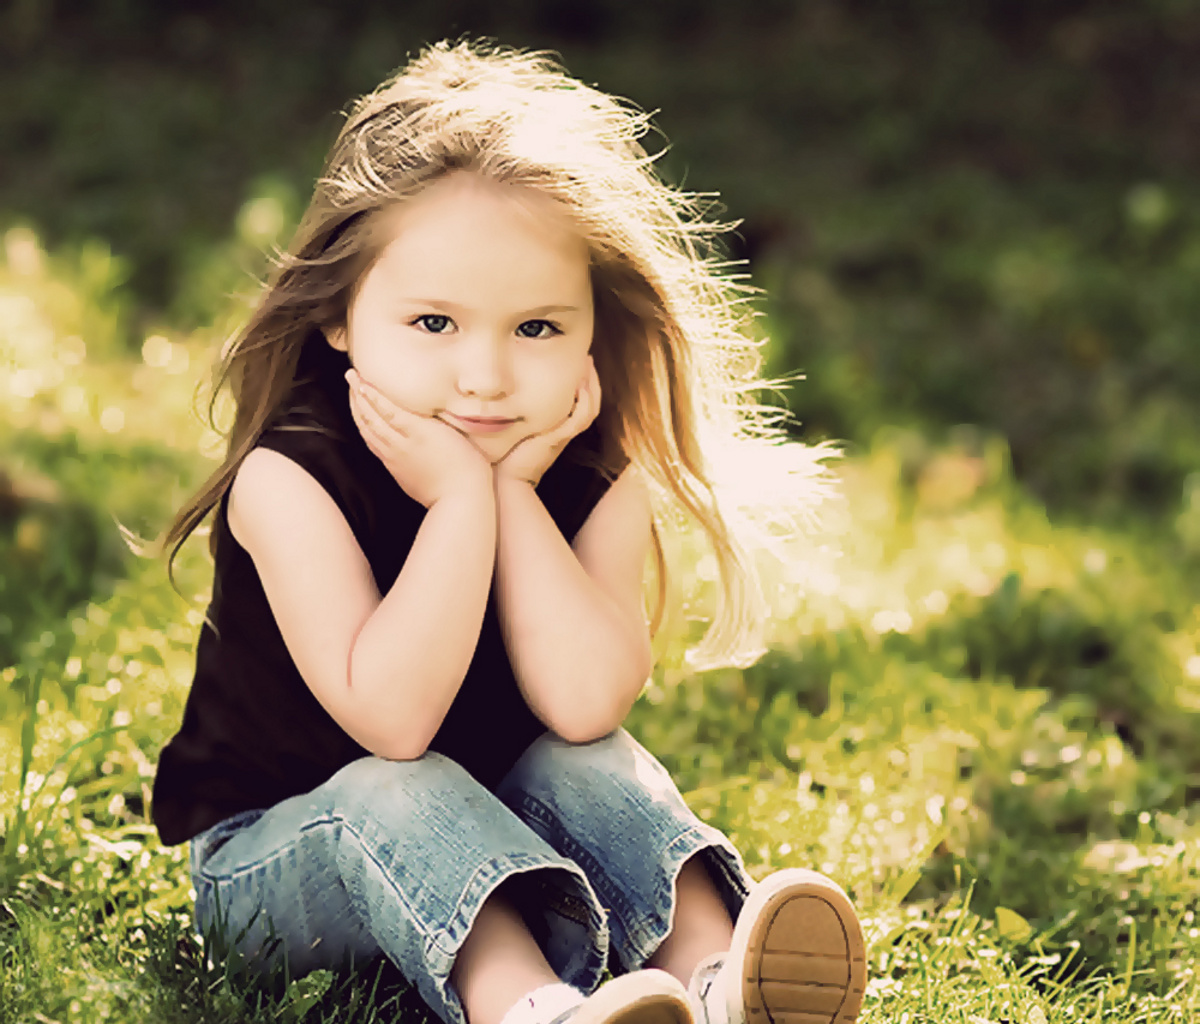 Sweet lady wallpapers 1200x1024 460507 - Cute little girl pic hd ...